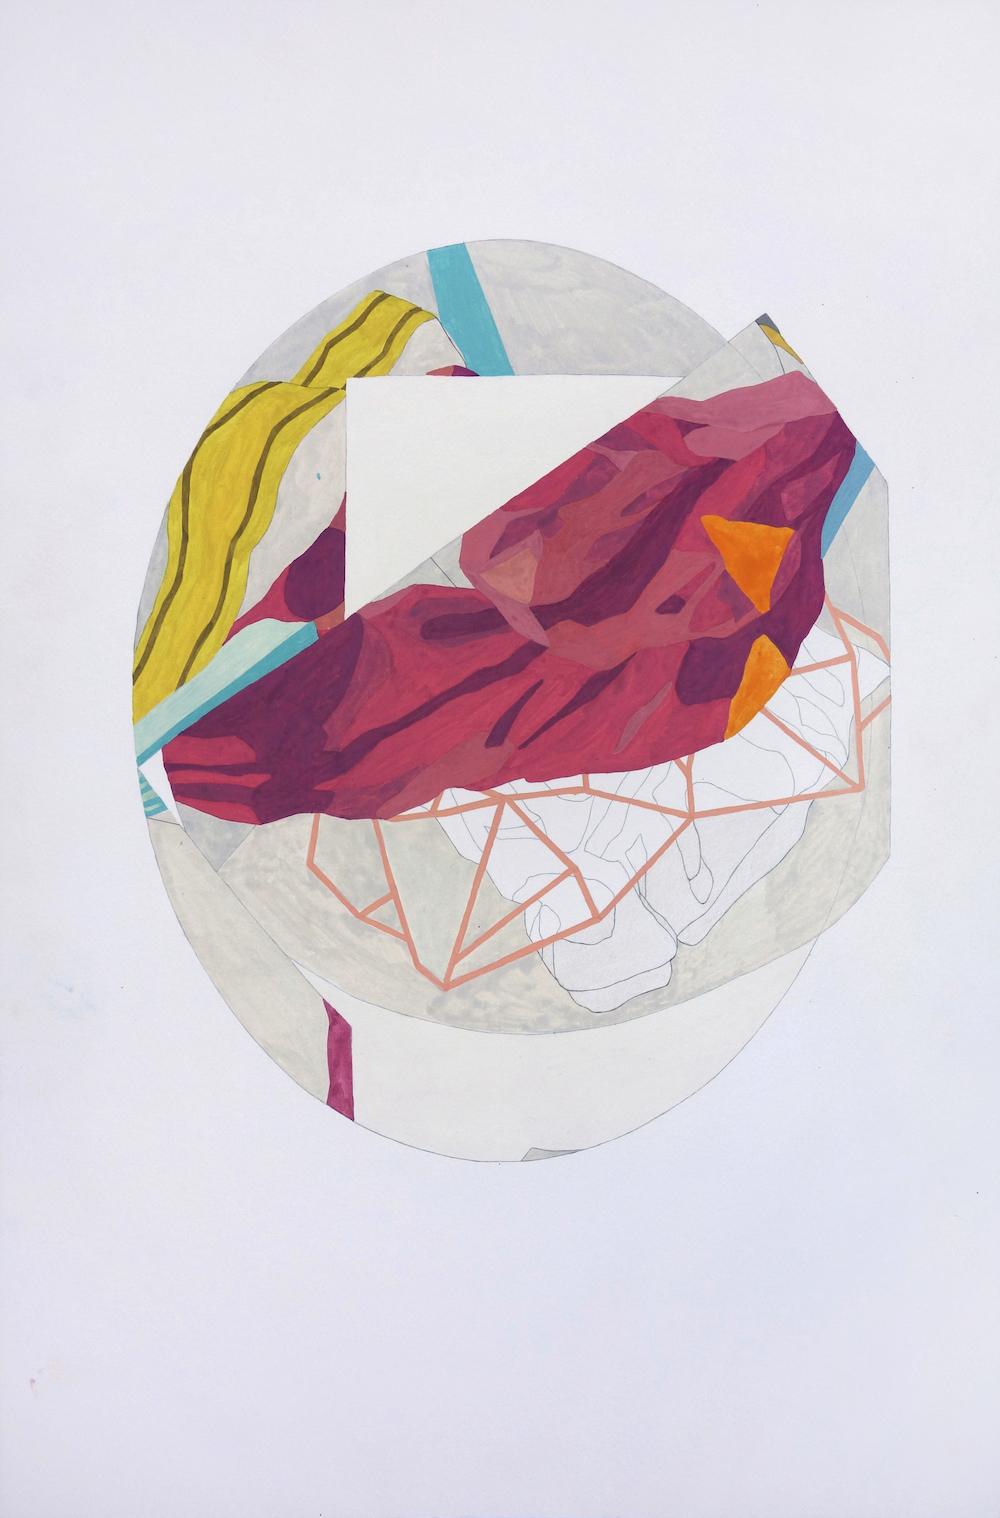 S/T (Serie Drapeados) | Gouache, acuarela y grafito sobre papel | 50 x 33 cm | 2016